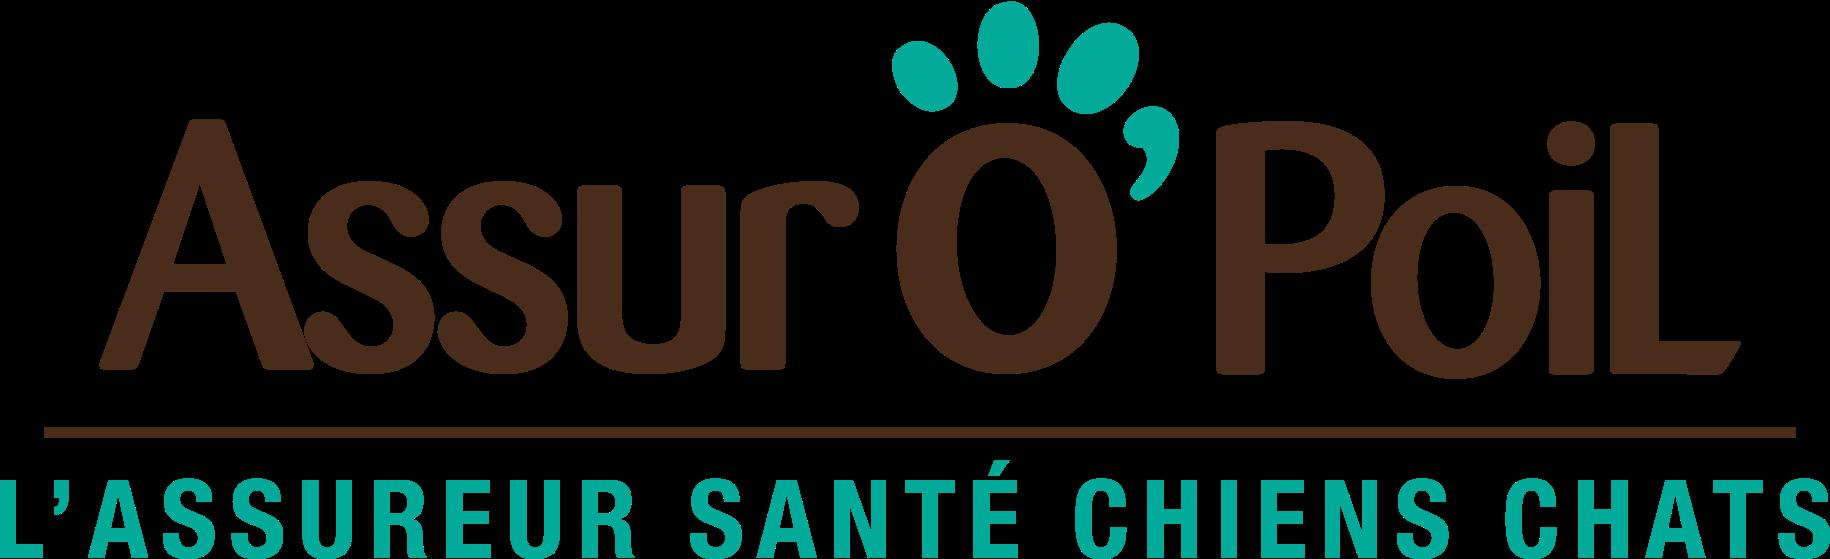 assuropoil_assur o'poil_assurance chiens_logo